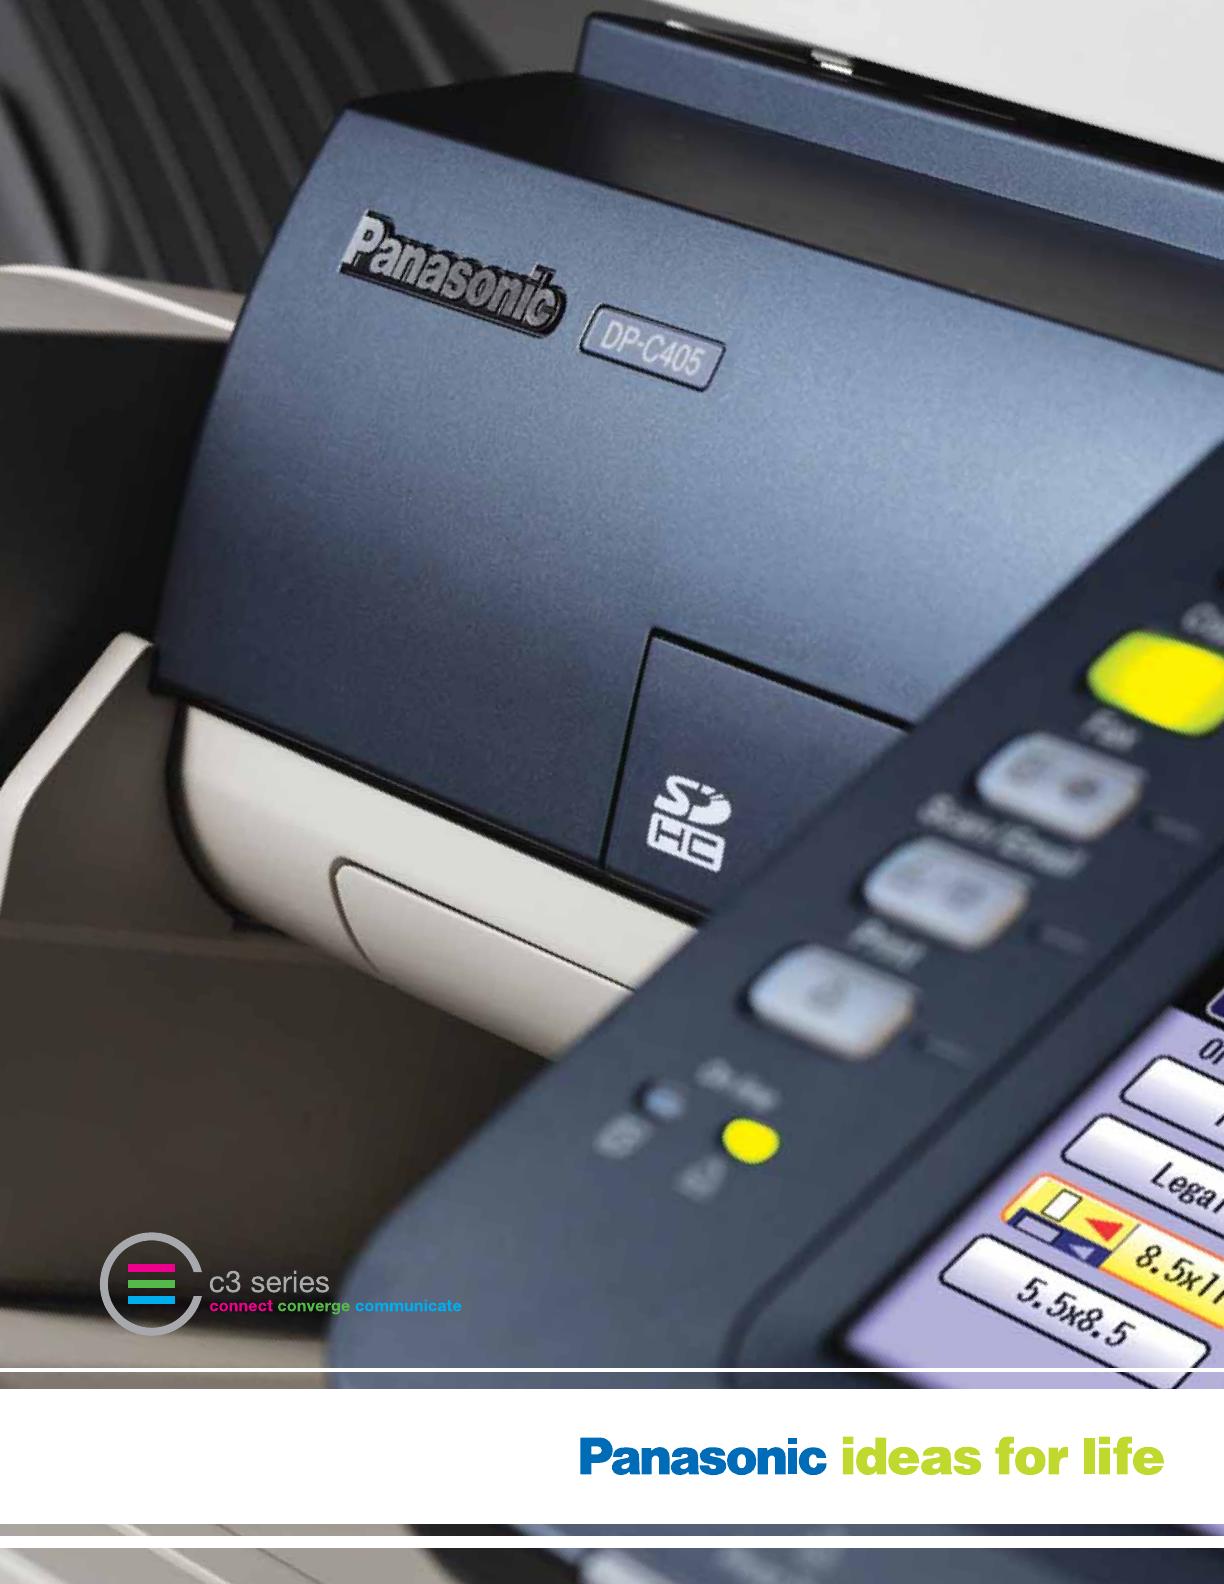 PANASONIC DP-C265 PCL6 DRIVERS PC